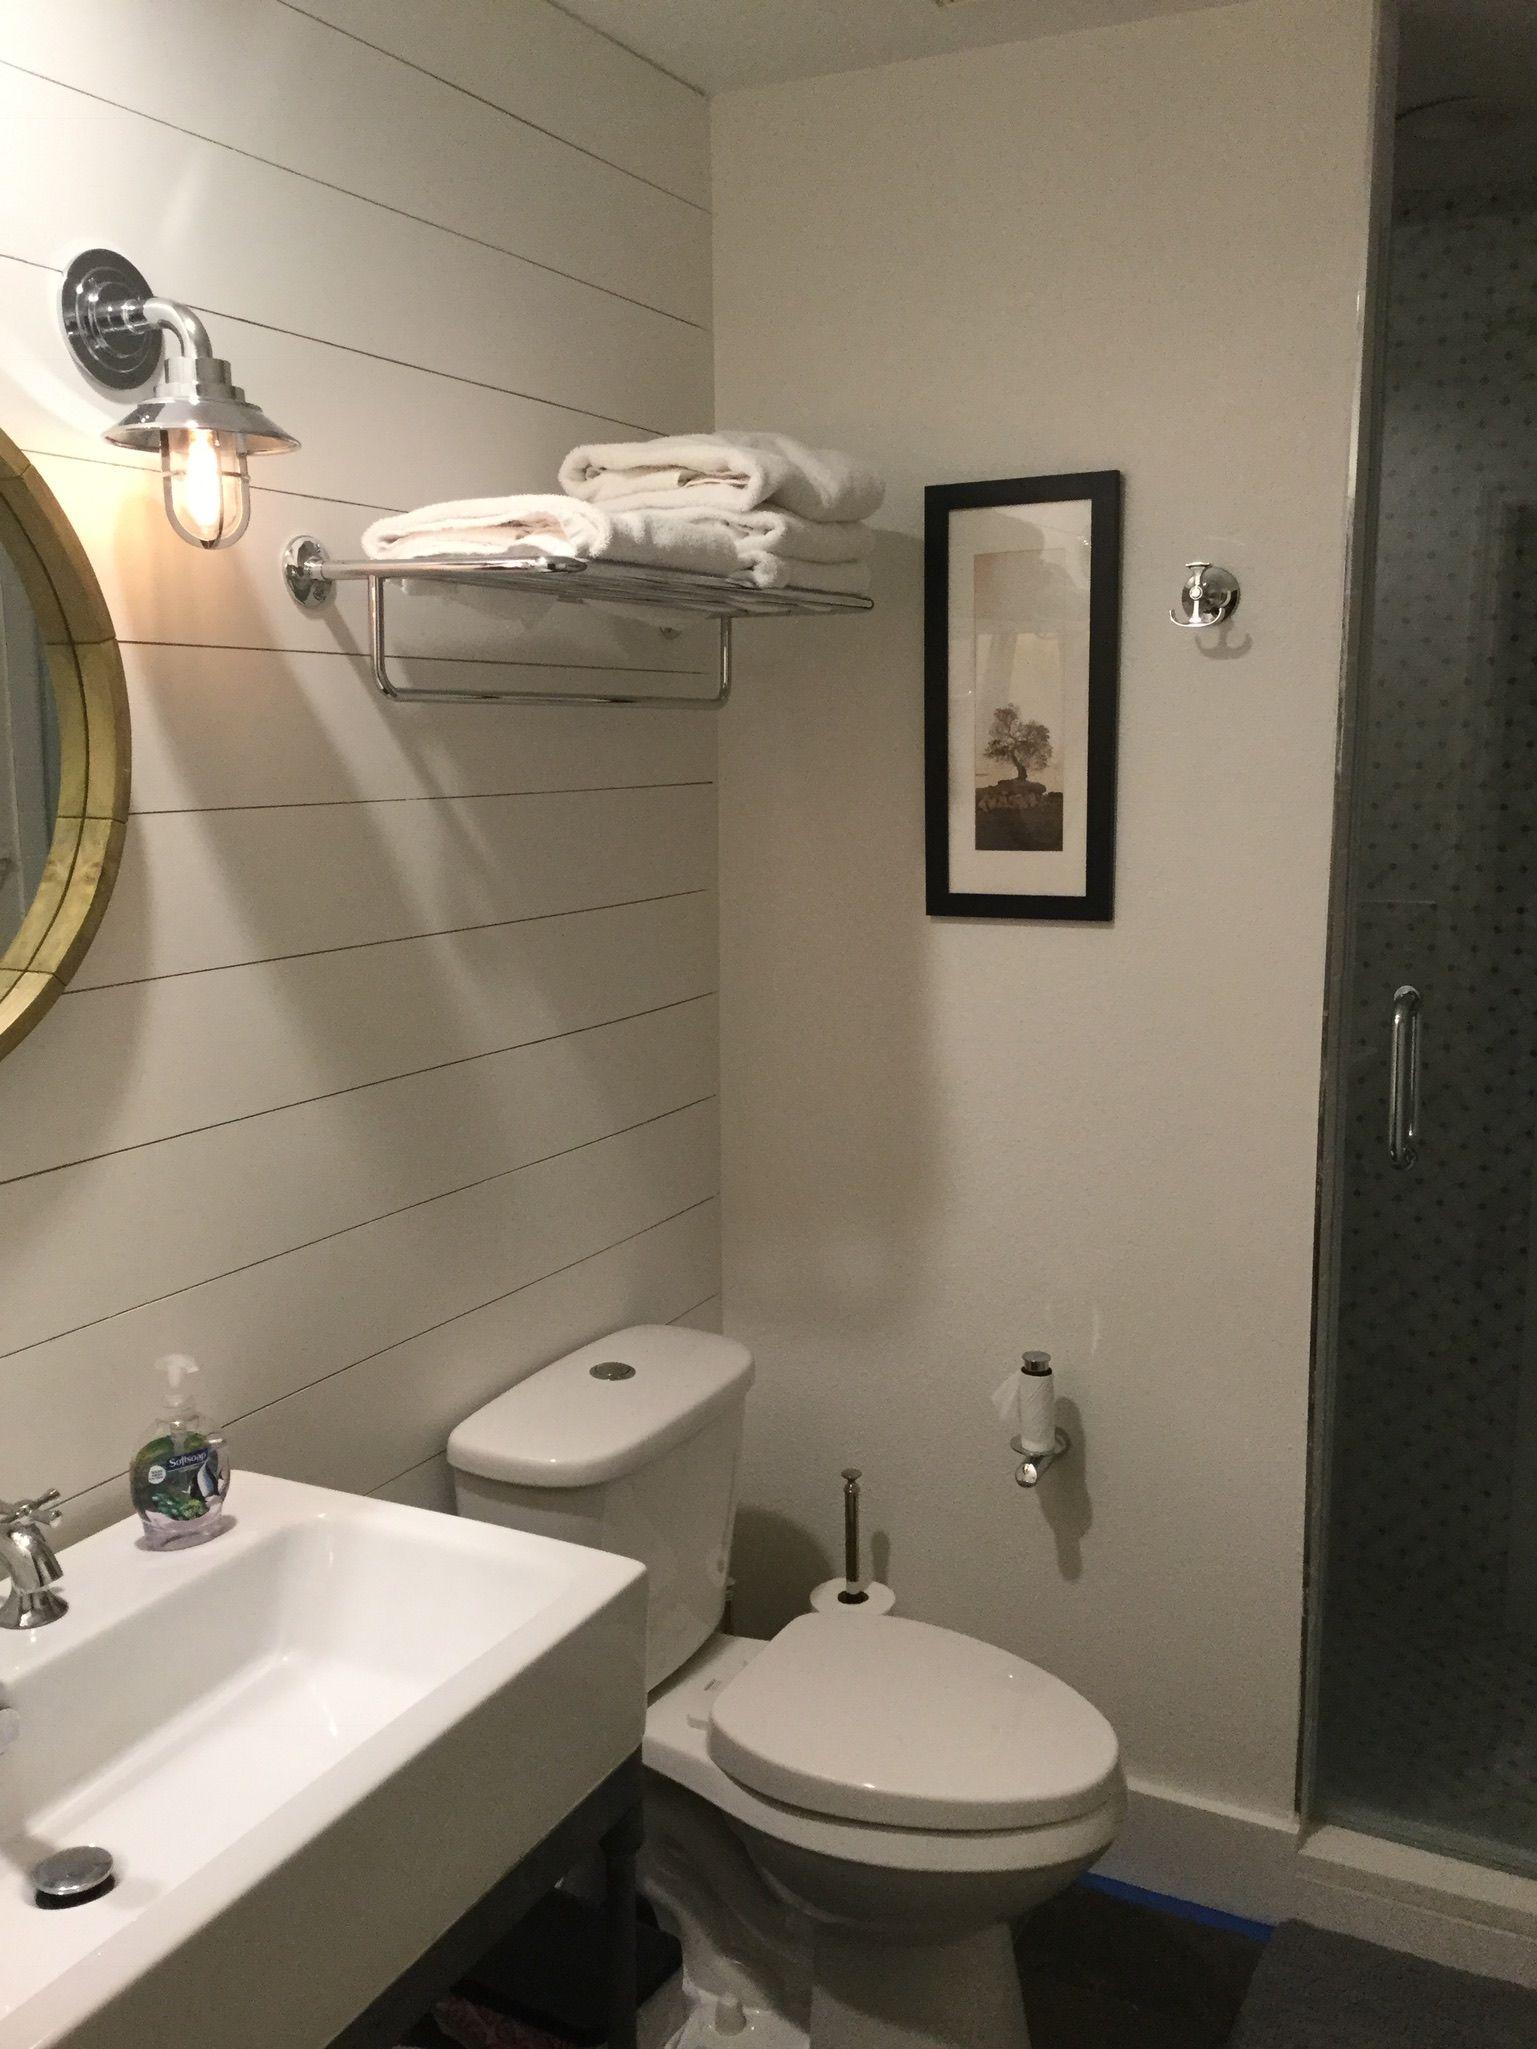 Bathroom Remodel Tampa Bay 813-360-3151   Remodeling ...